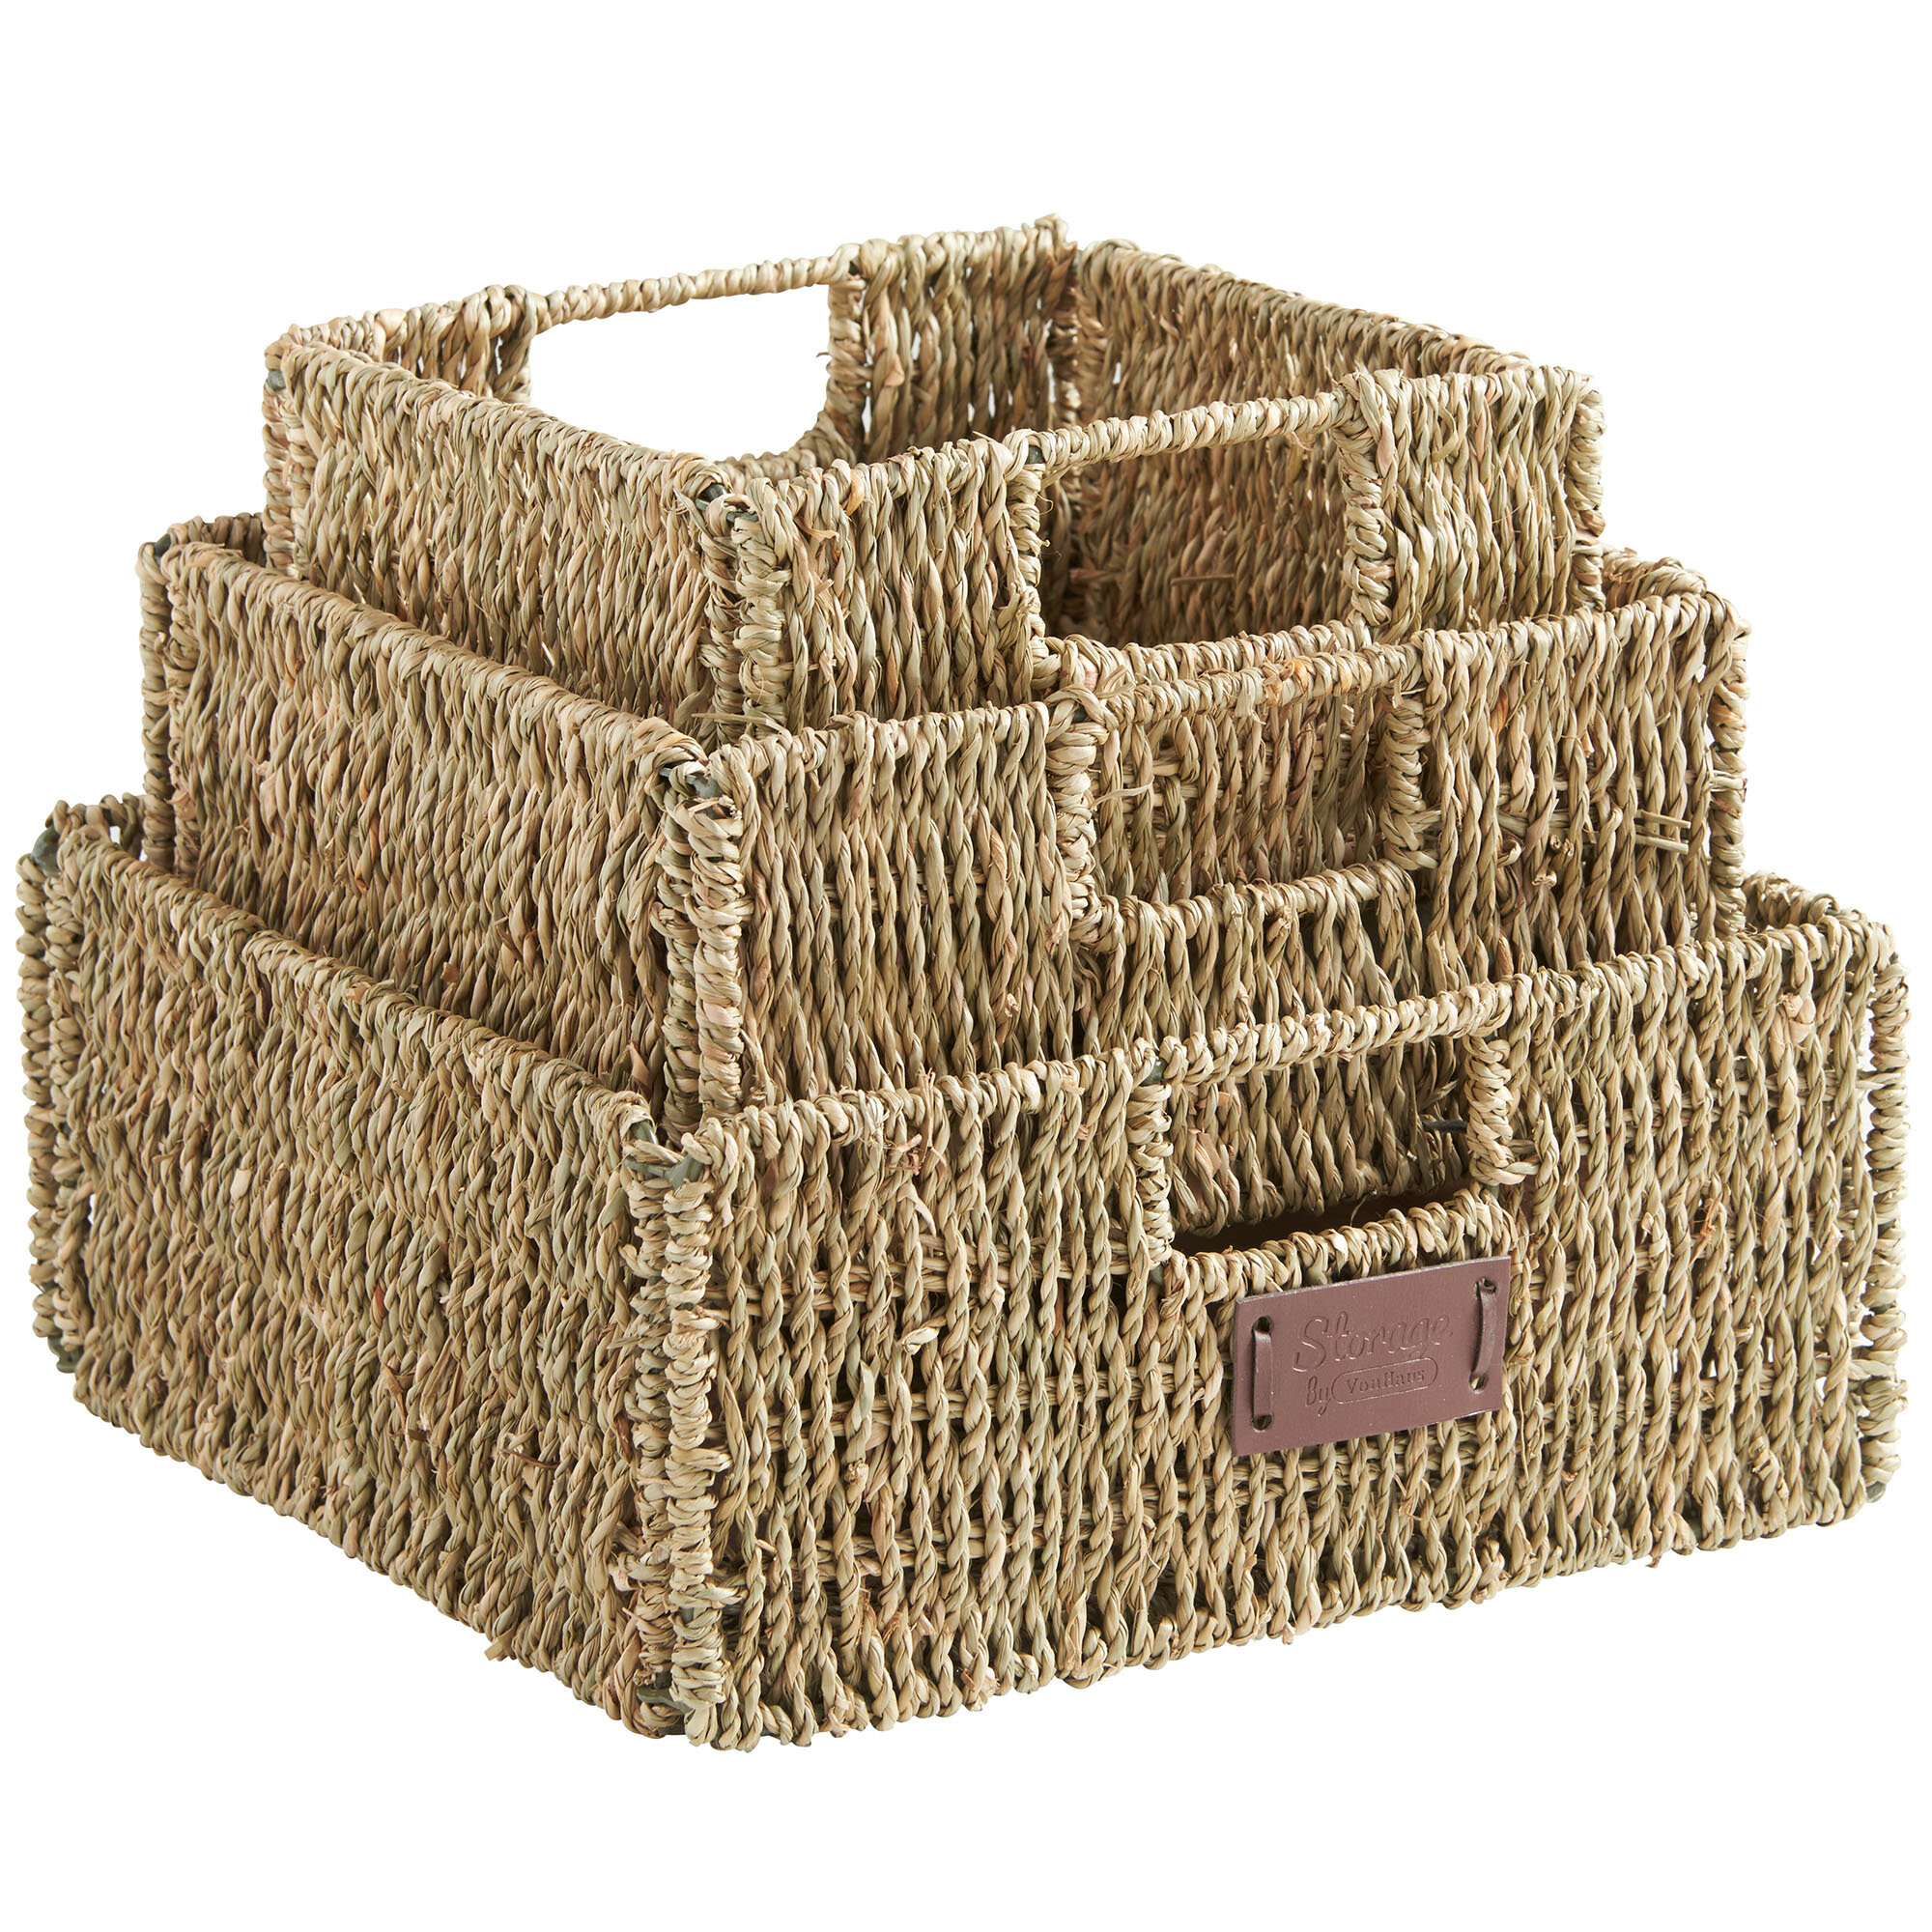 VonHaus 3 Piece Square Seagrass Storage Basket Set U0026 Reviews | Wayfair